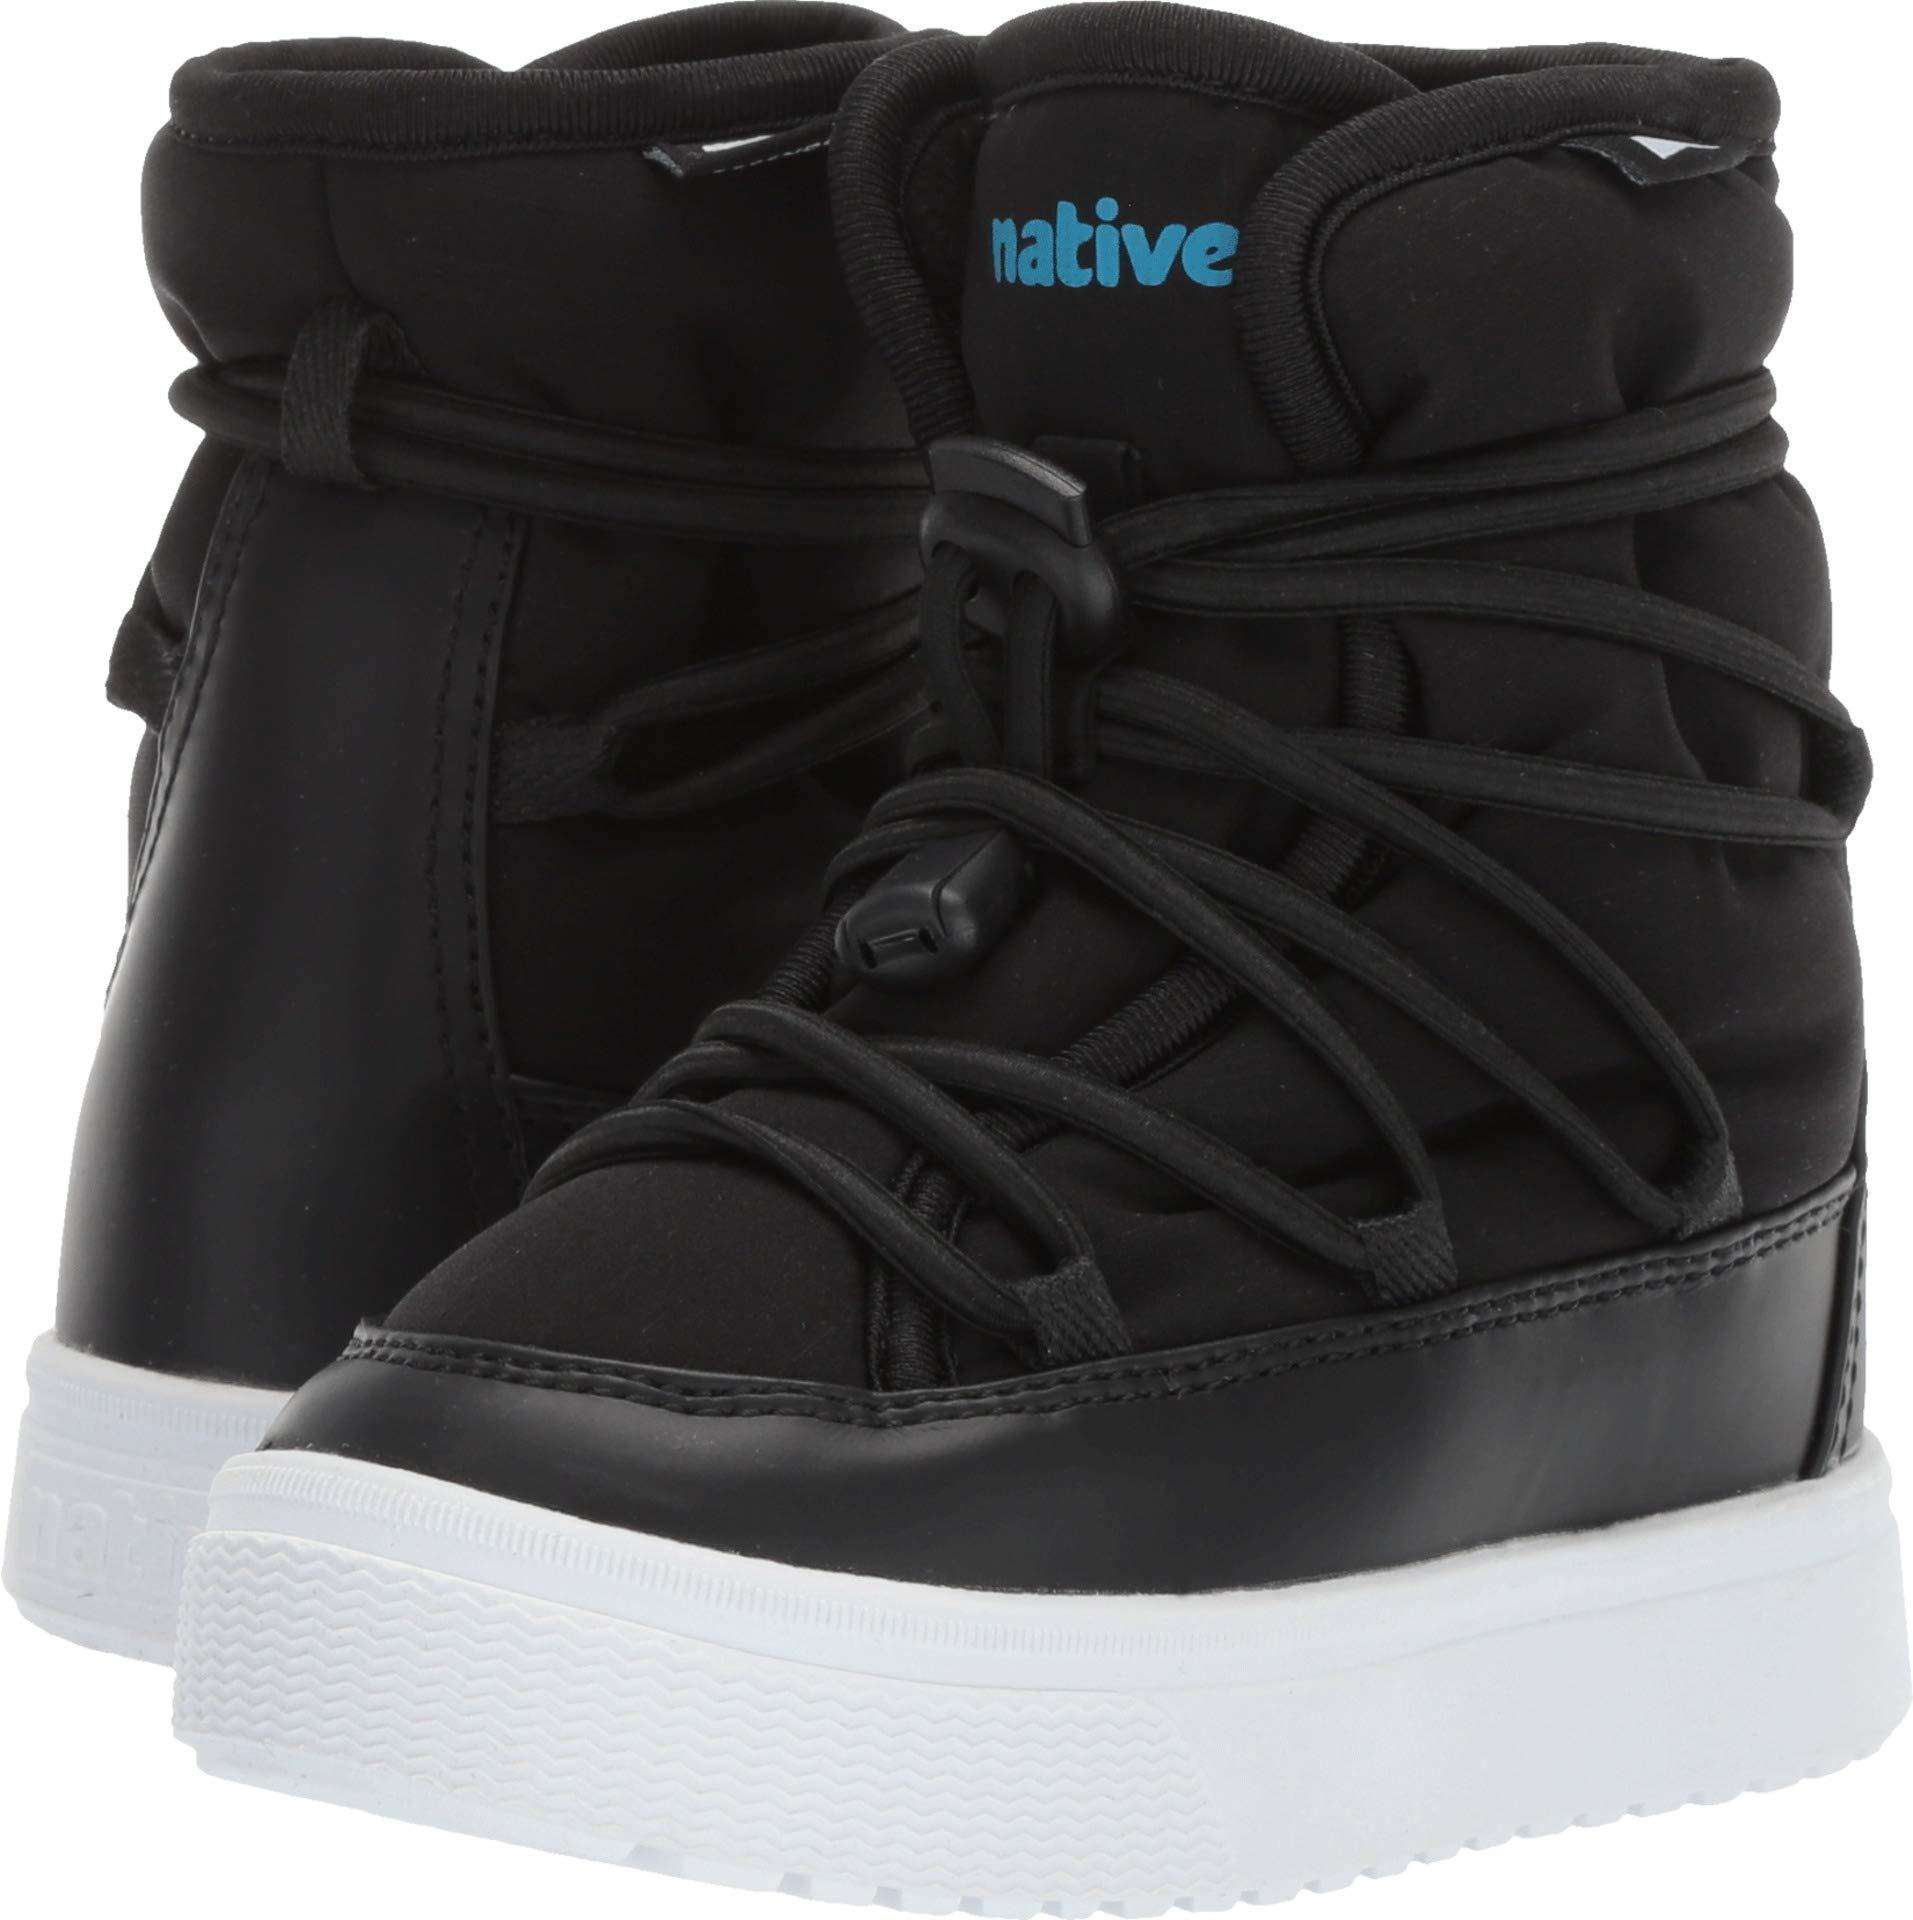 Native Kids Shoes Unisex Chamonix (Toddler/Little Kid) Jiffy Black/Shell White 8 M US Toddler